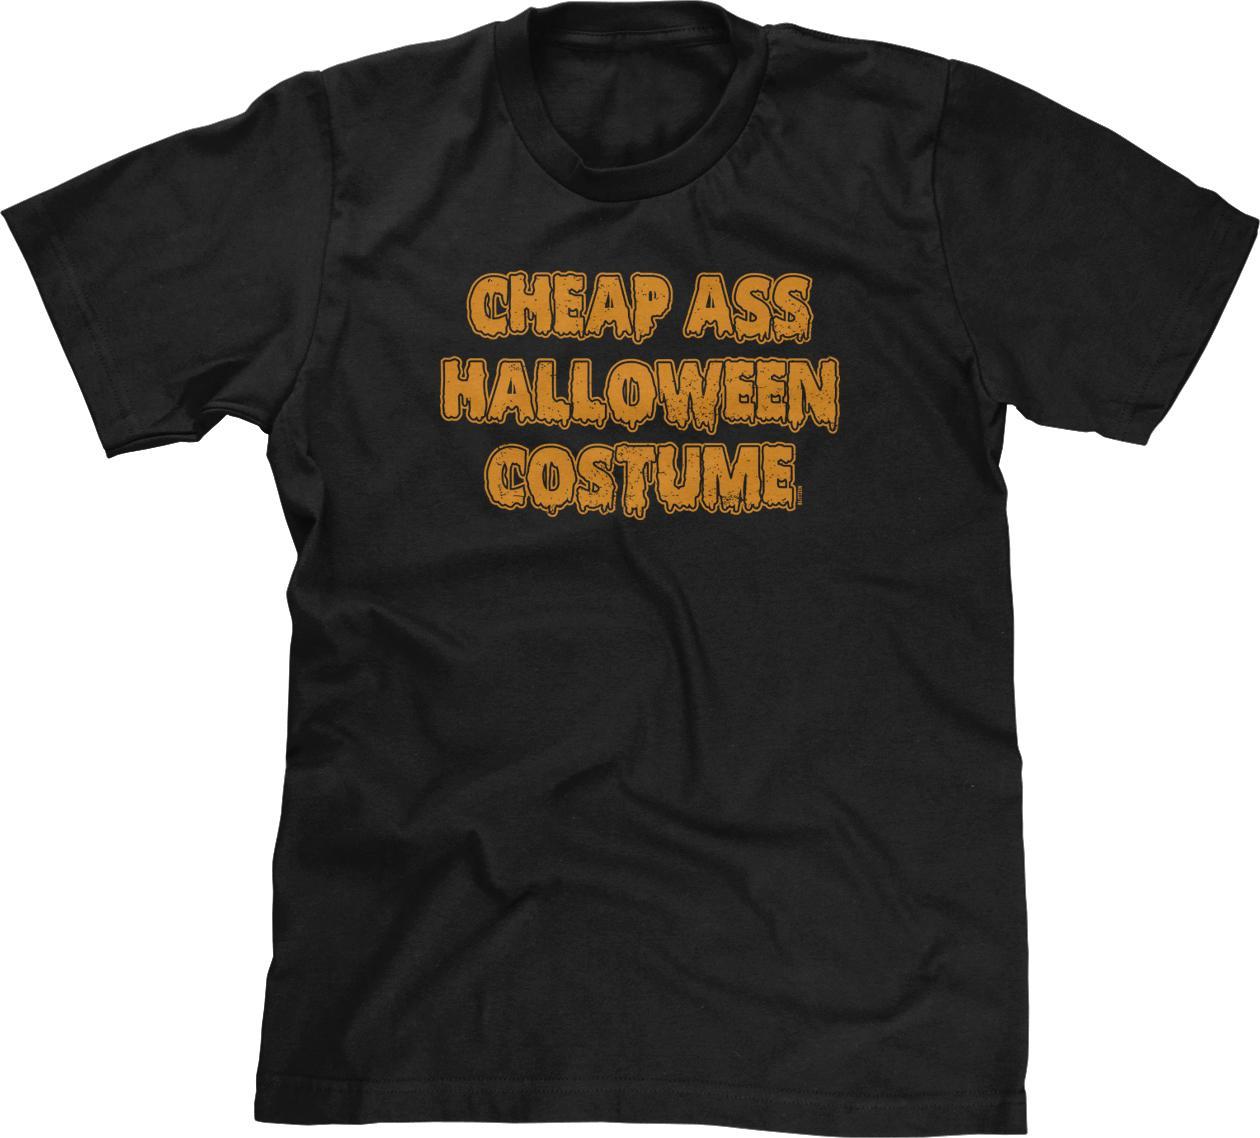 de89997f6486 Cheap Ass Halloween Costume Funny Humor Joke Lazy Meme Parody Mens Tee Funny  Unisex Humor Shirts Offensive T Shirt From Clothing_deals, $12.96   DHgate.Com